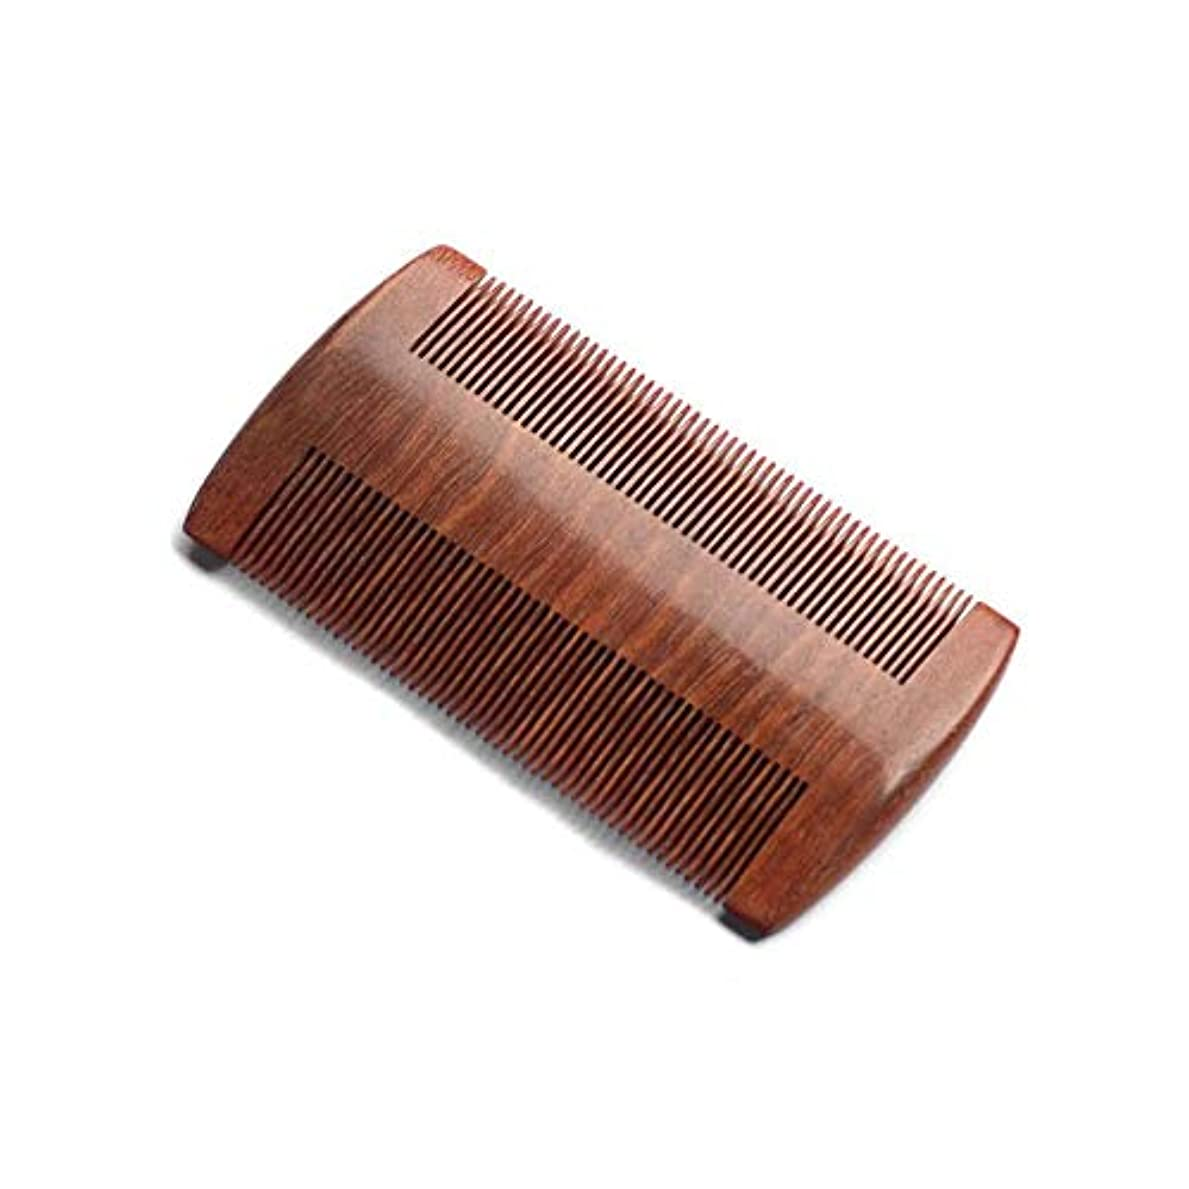 ZYDP 細かいコンパクトな歯赤白檀の髪の櫛手作りの櫛帯電防止髪の櫛